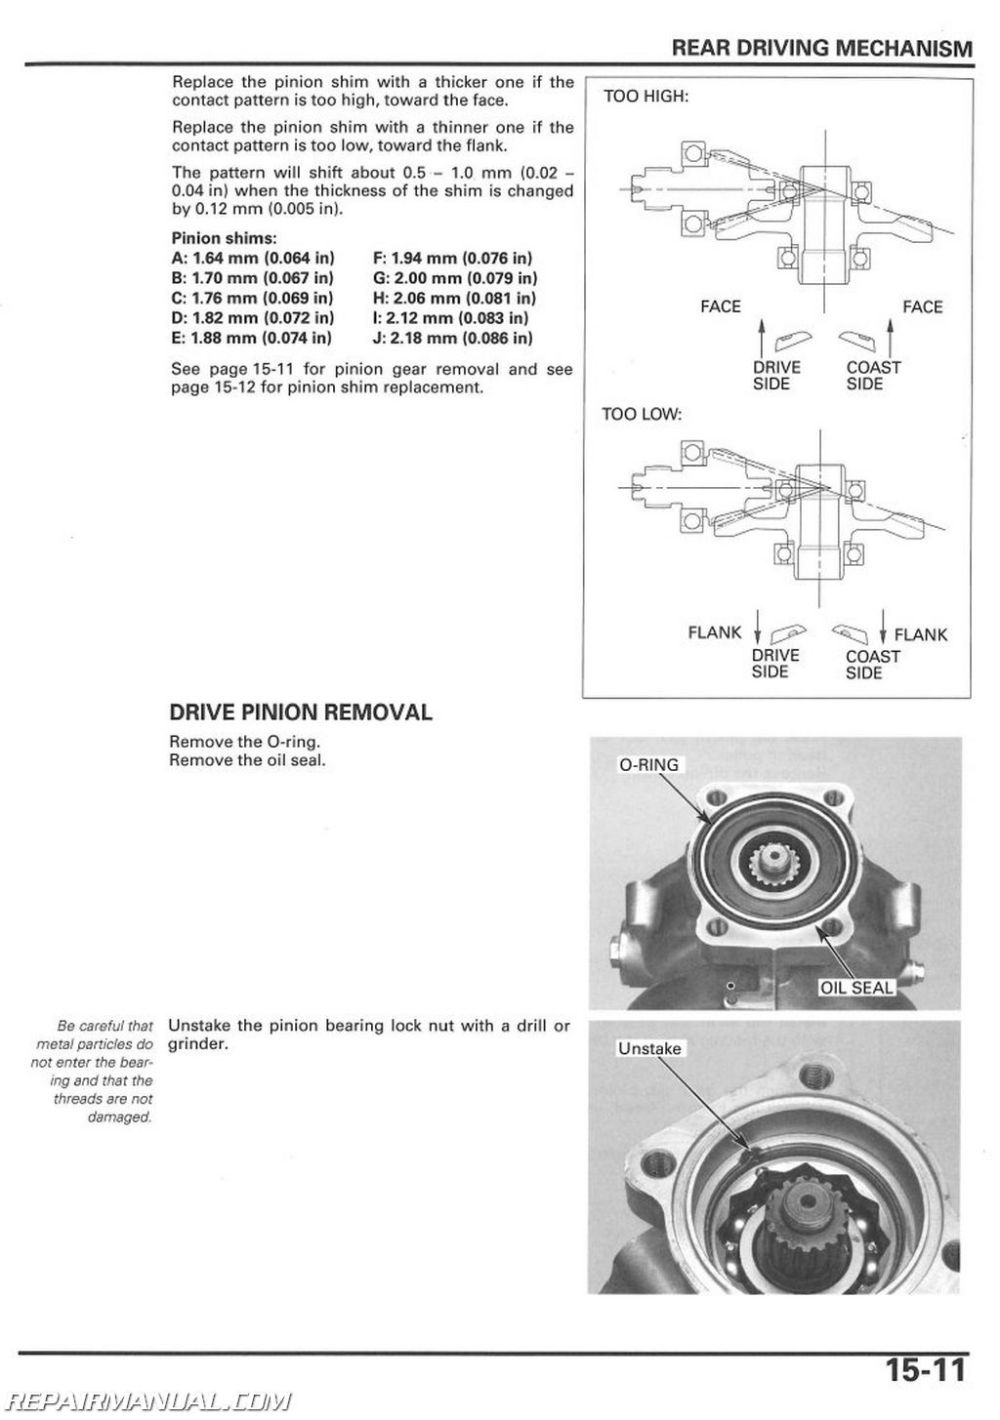 medium resolution of 2005 2018 honda trx250te tm recon atv service manual rh repairmanual com 1998 honda 250 recon